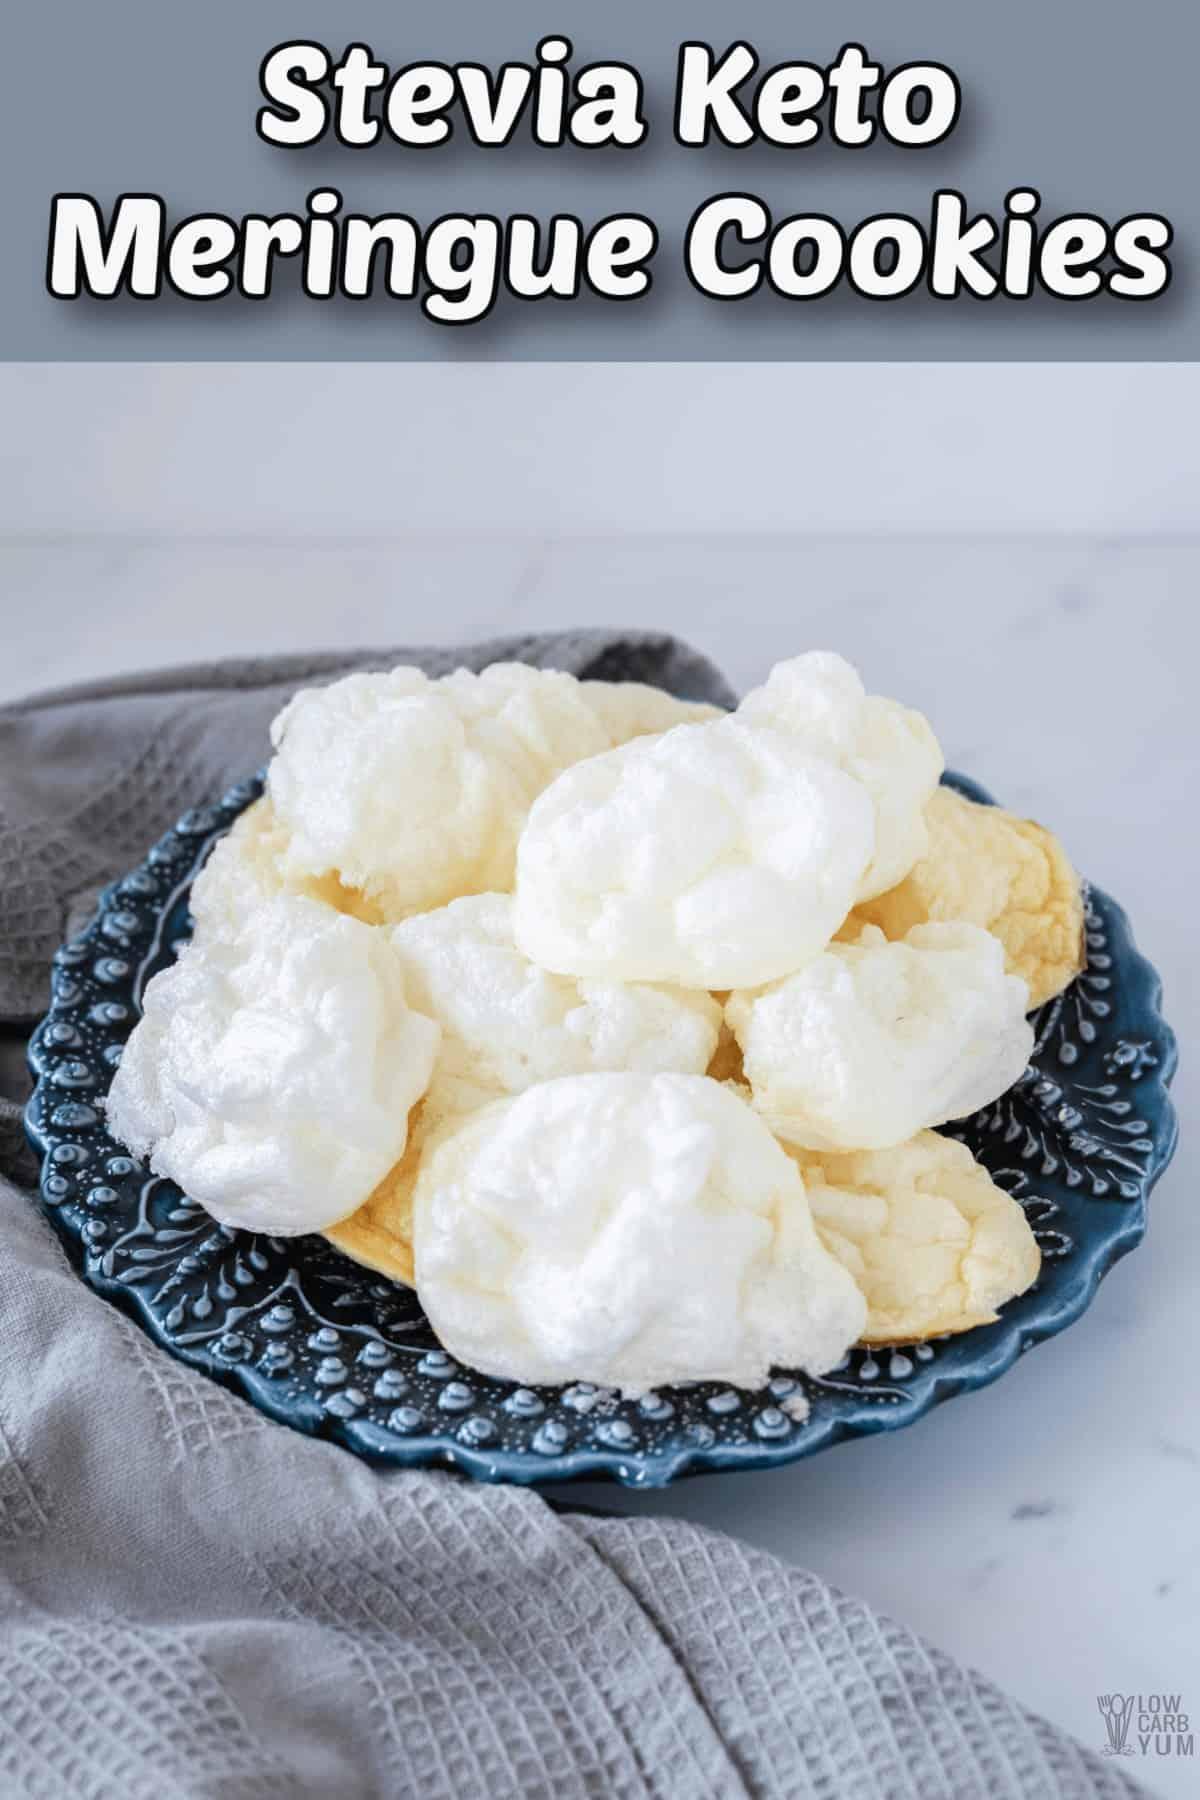 stevia keto meringue cookies pintrest image